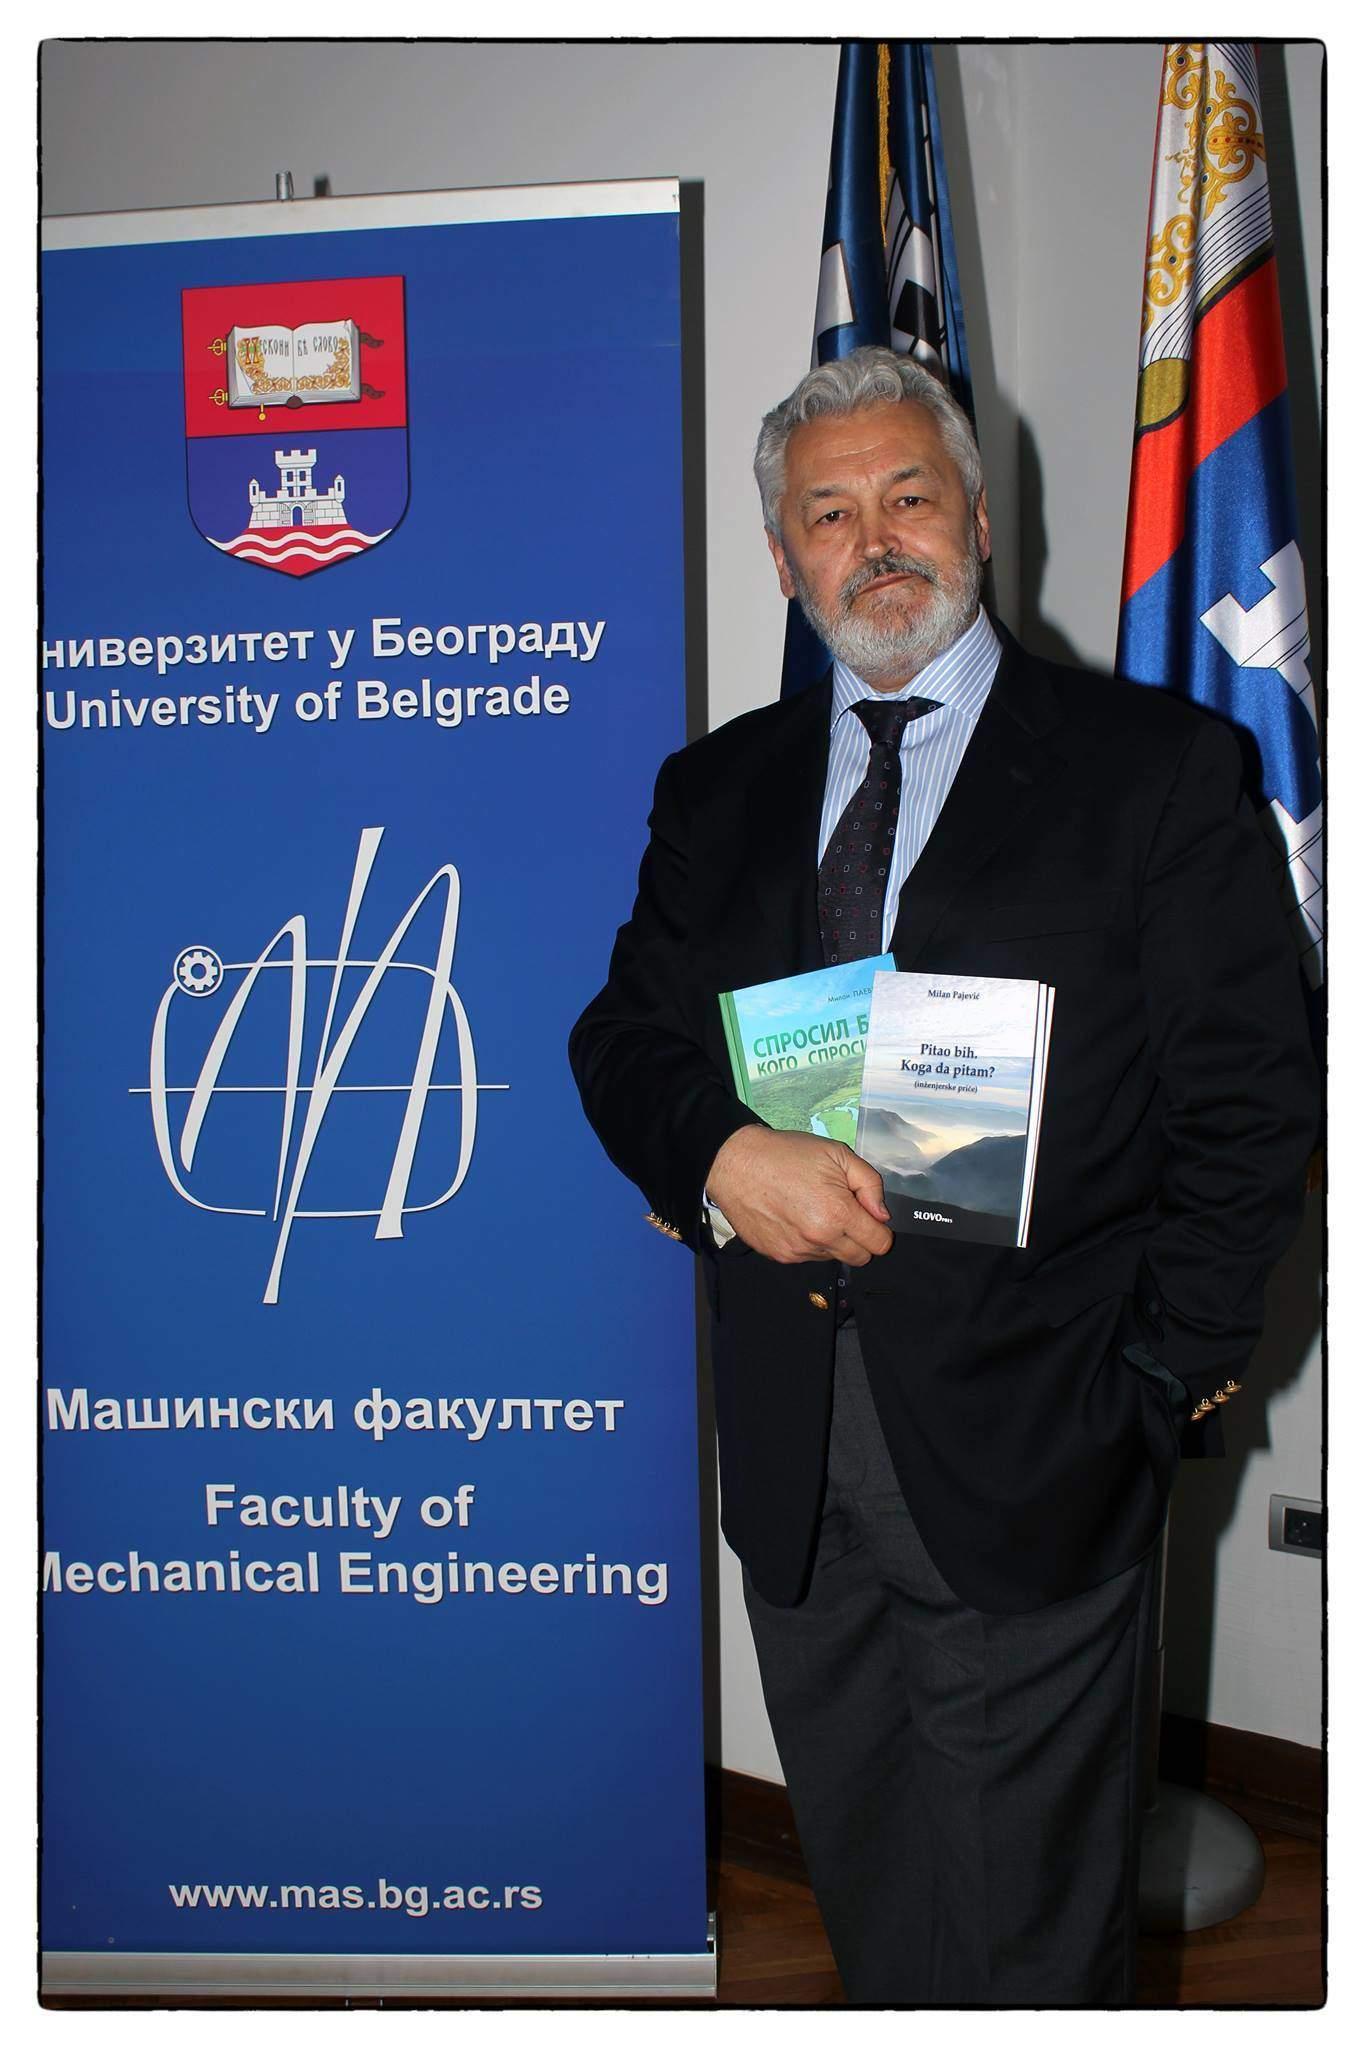 Milan Pajević na promociji knjige na Mašinskom fakultetu u Beogradu